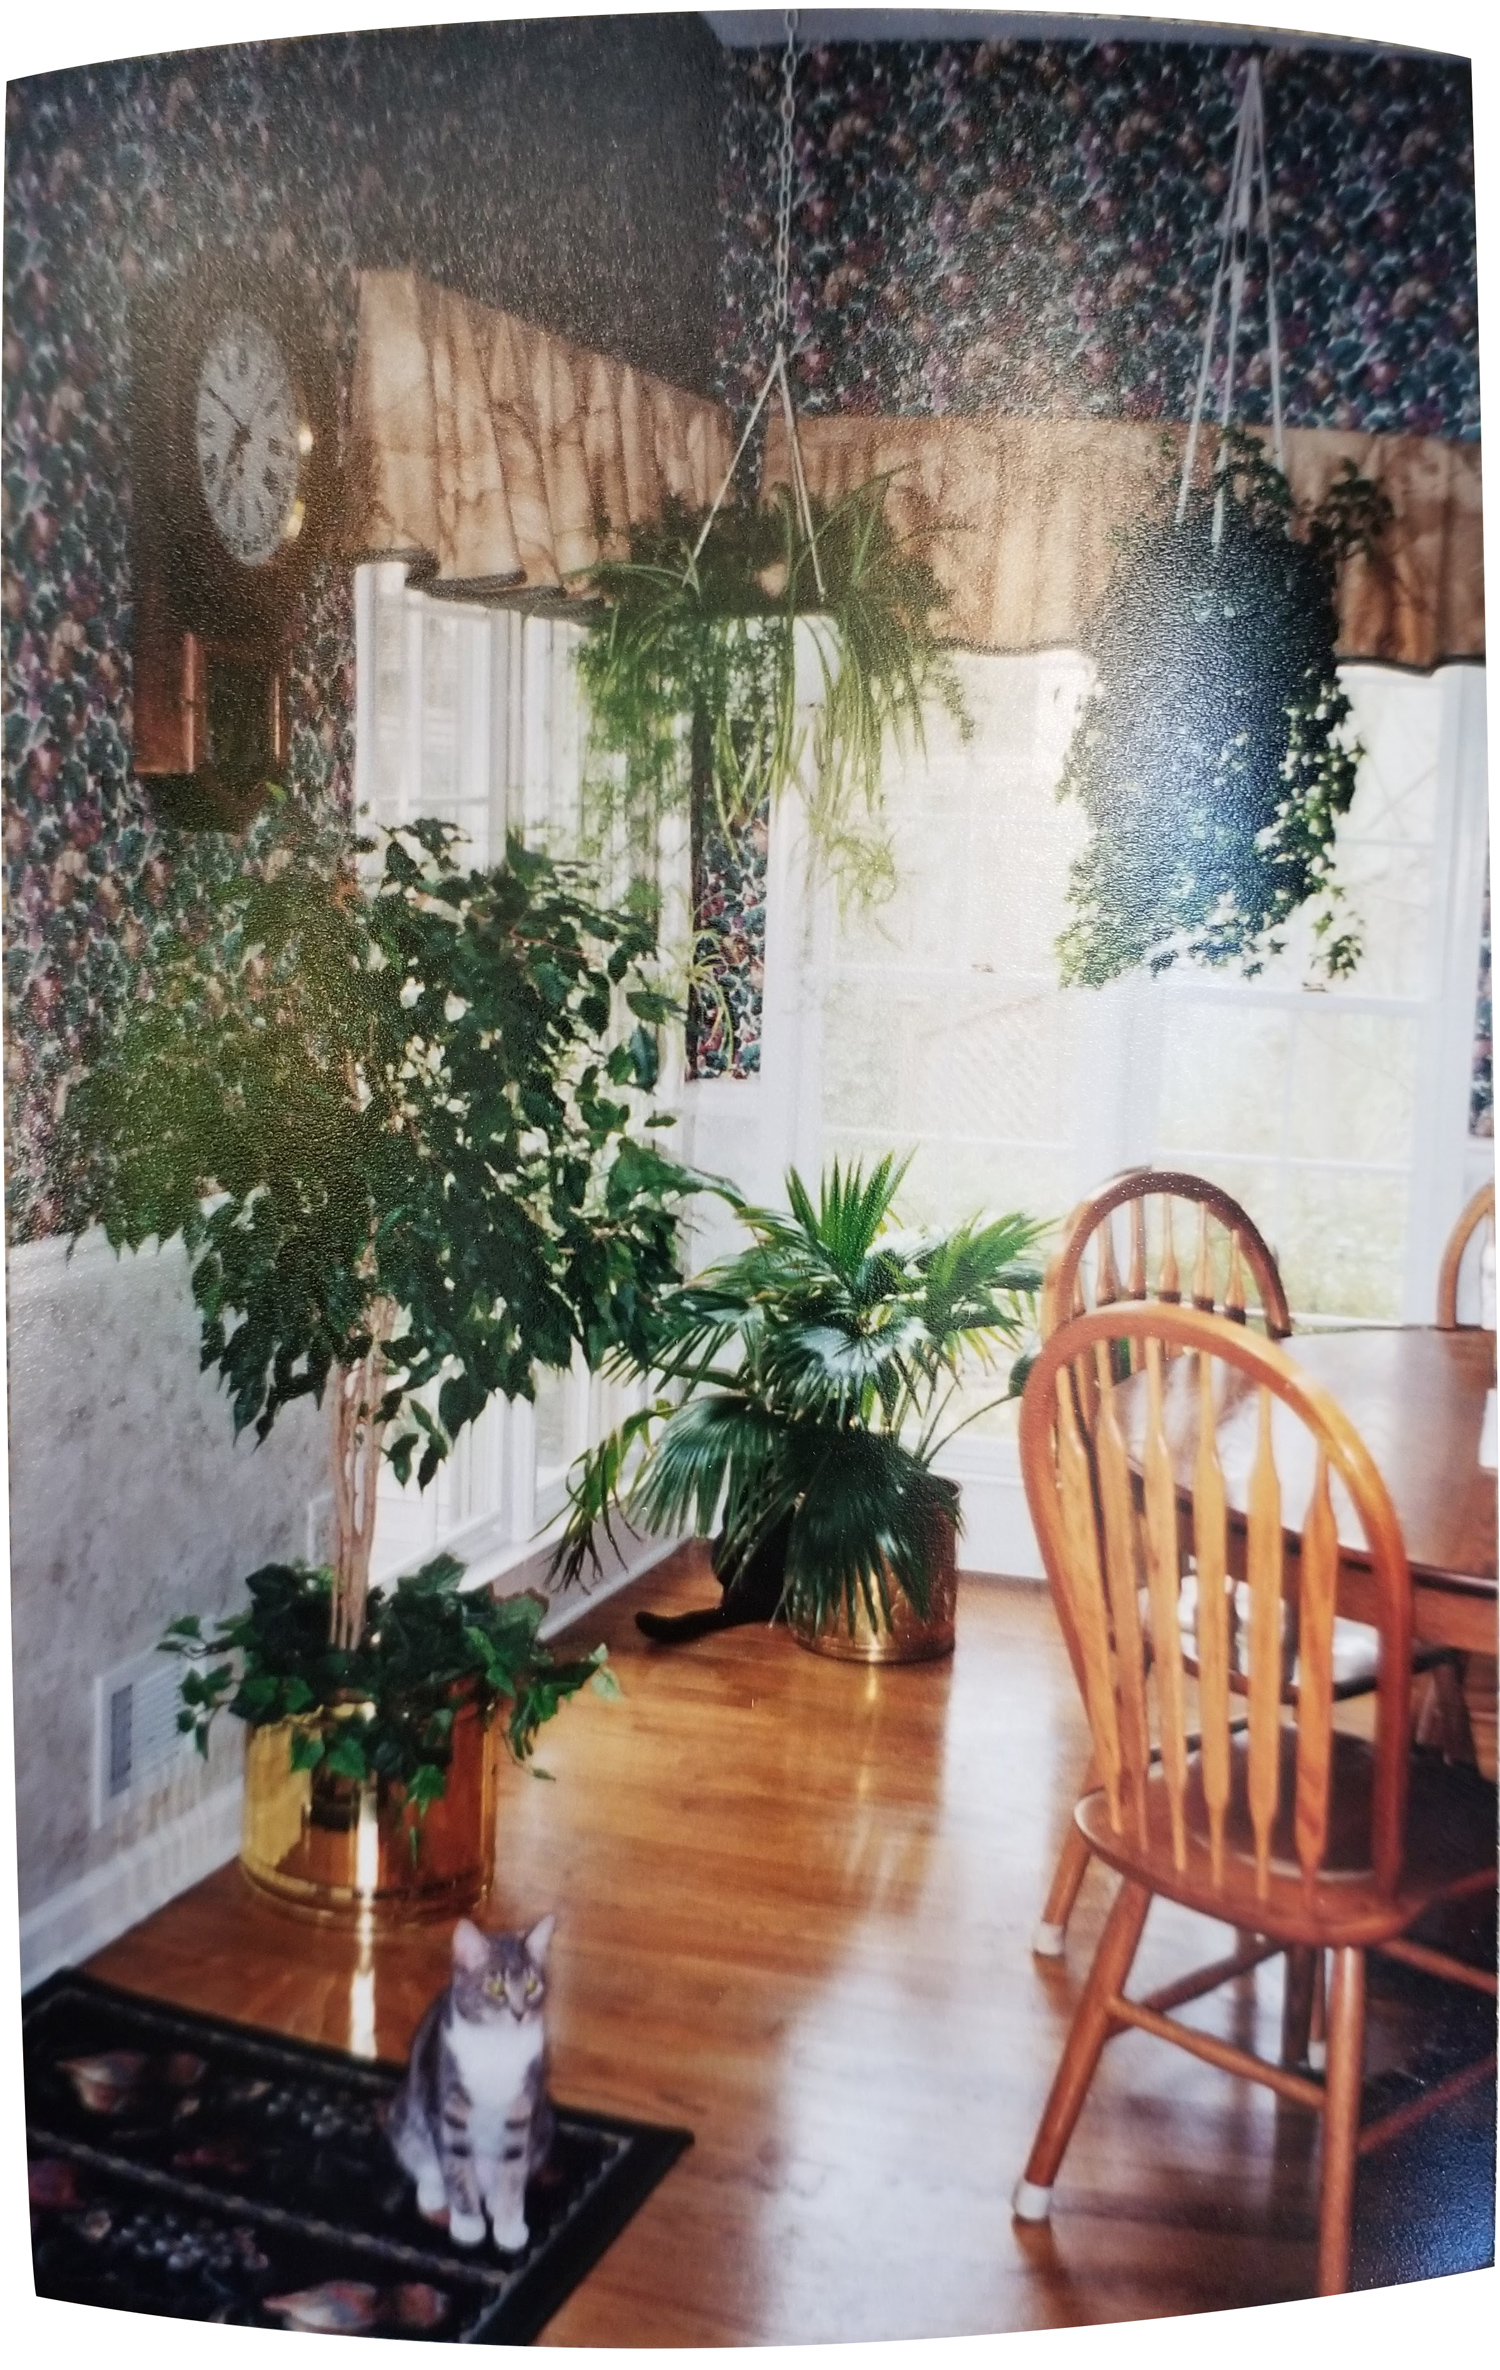 1996-momskitchen-tia-bianca-plants.jpg